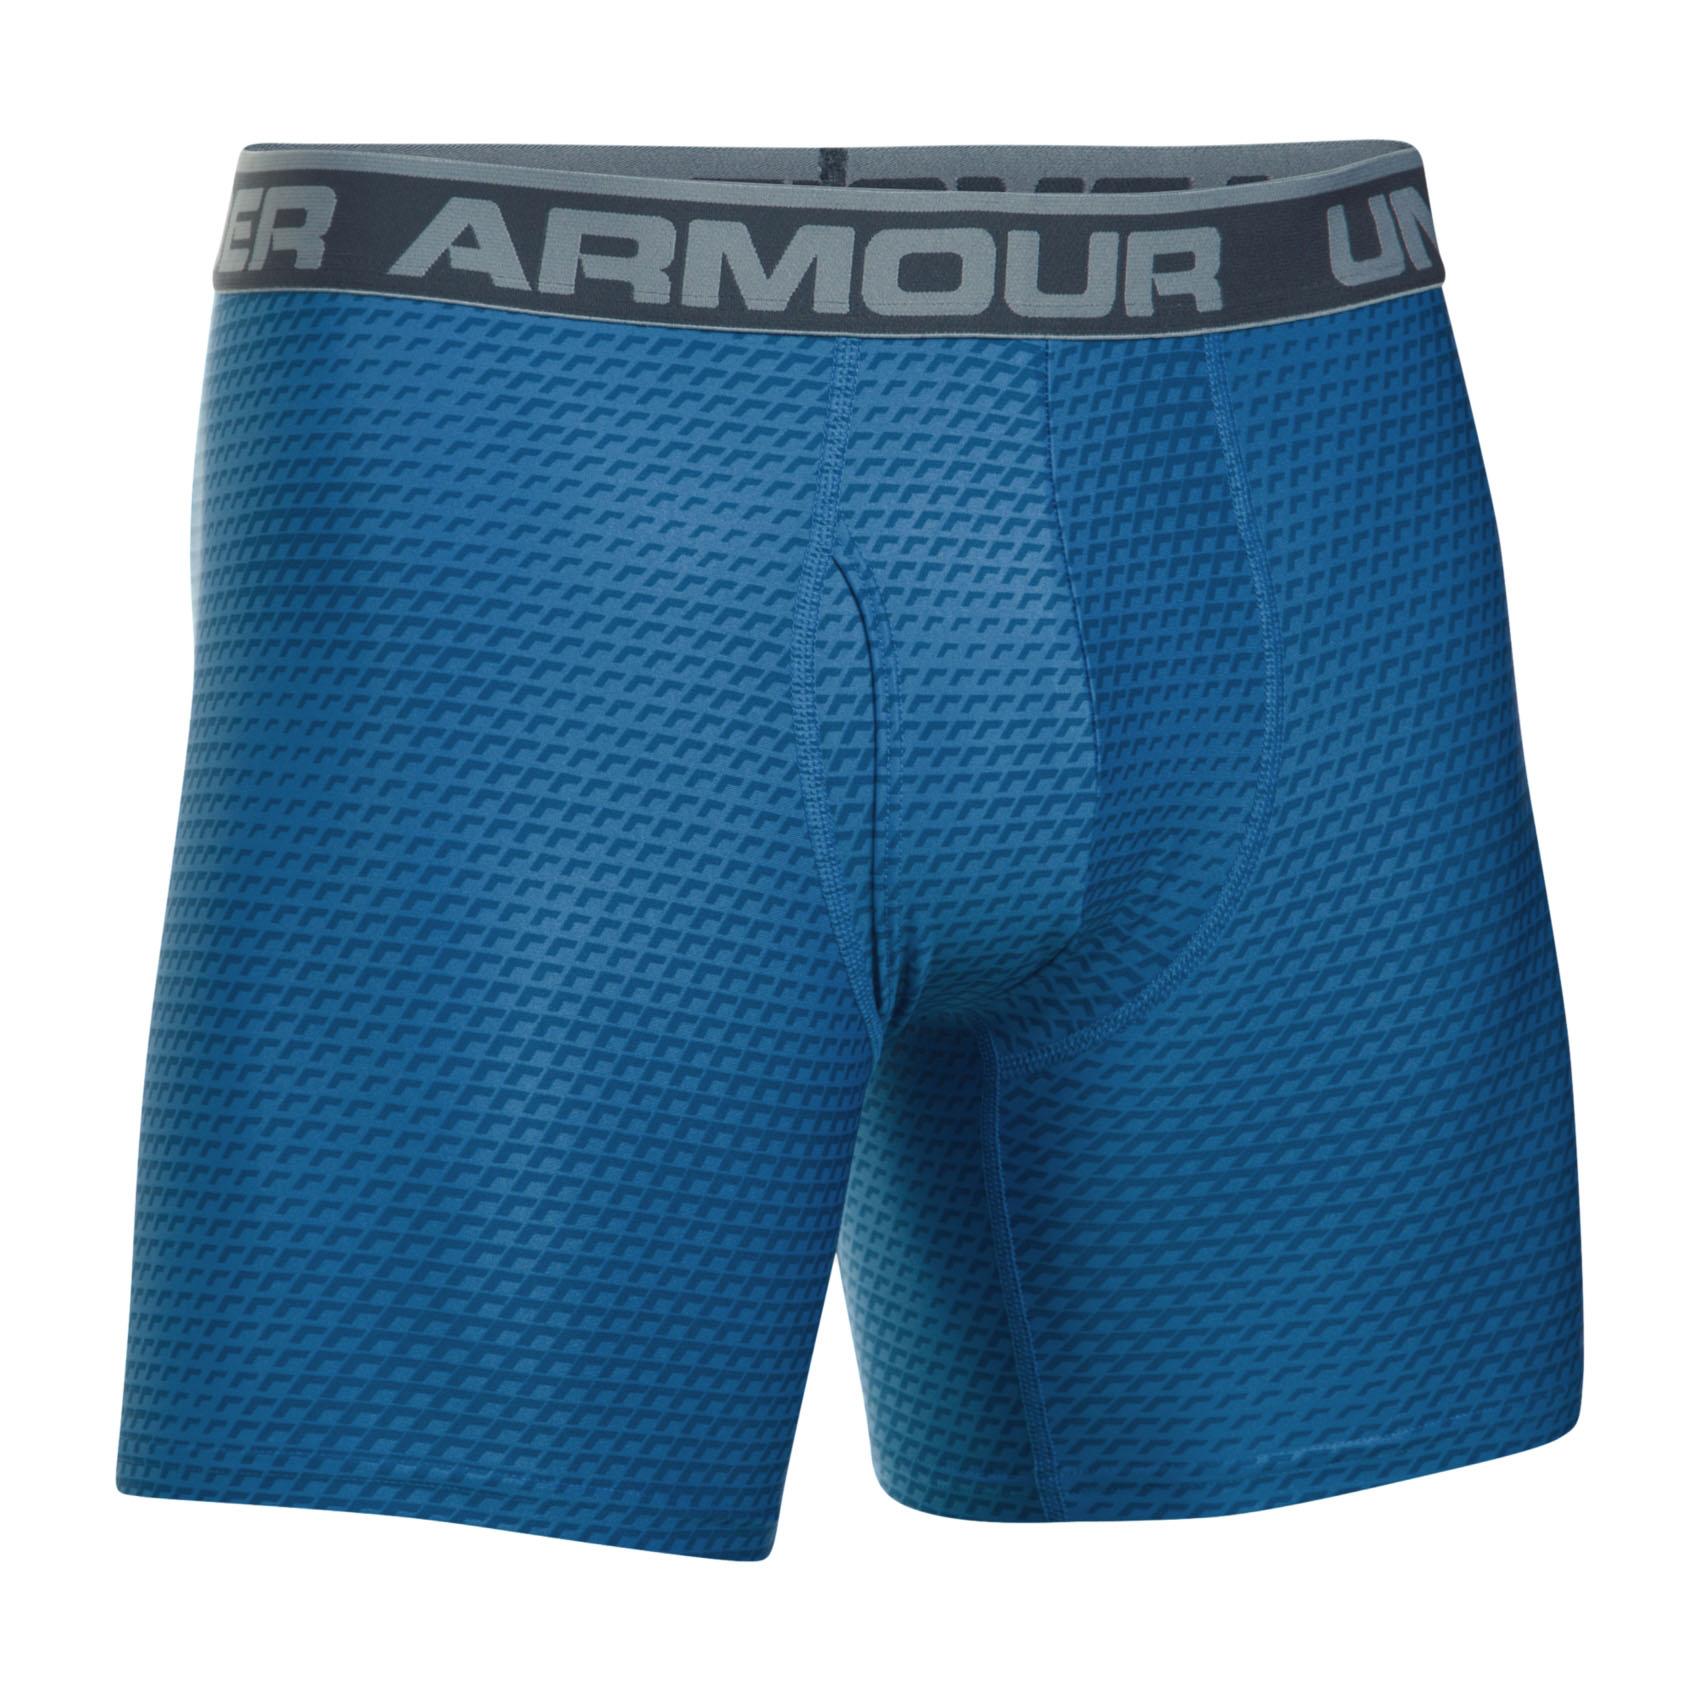 Under Armour Mens O Series 6 In Printed Underwear